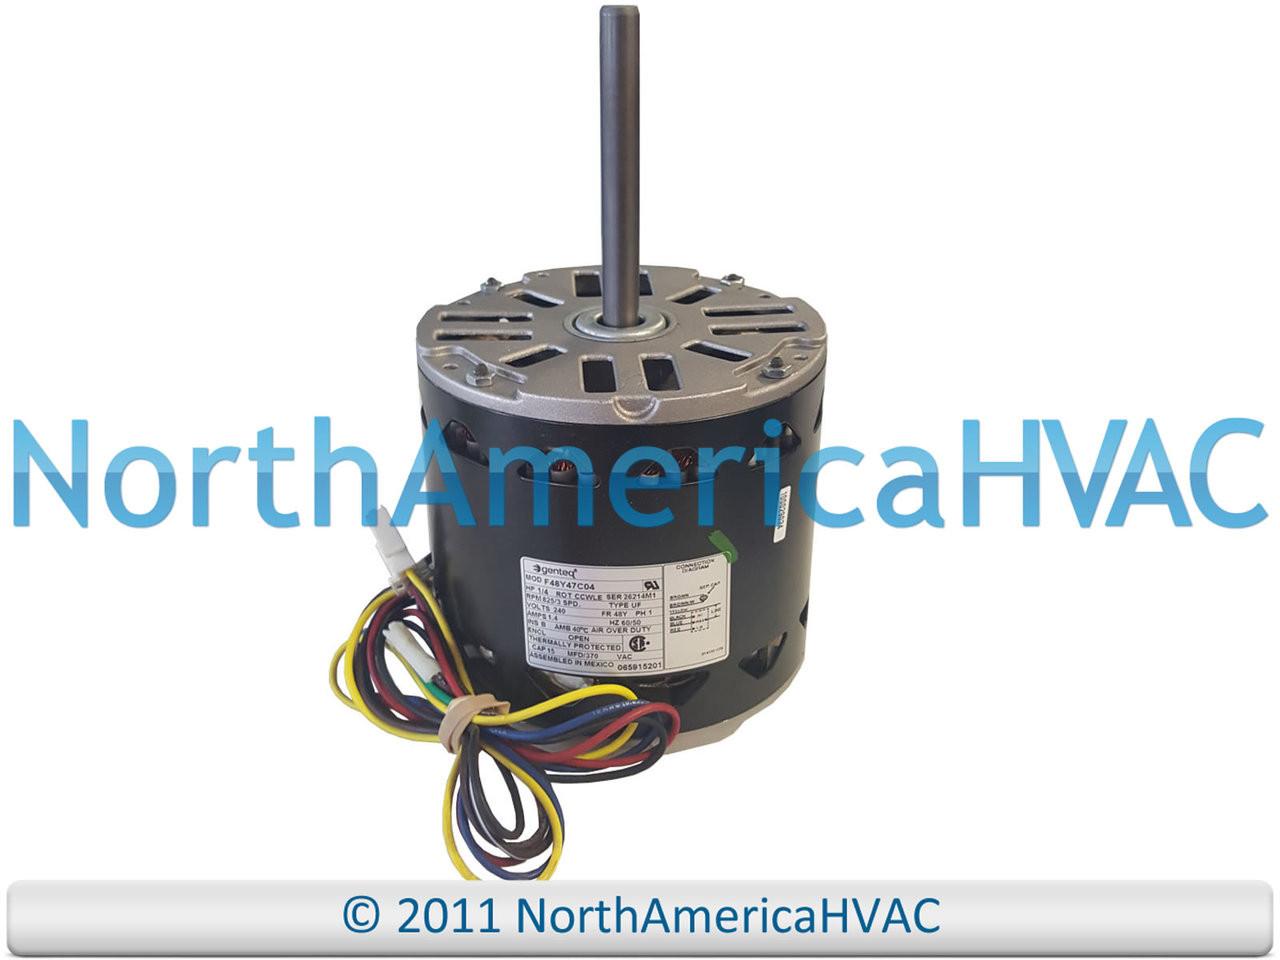 OEM Lennox Armstrong Ducane 1/4 HP 240v Furnace Blower Motor 41W51 41W5101  - North America HVACNorth America HVAC